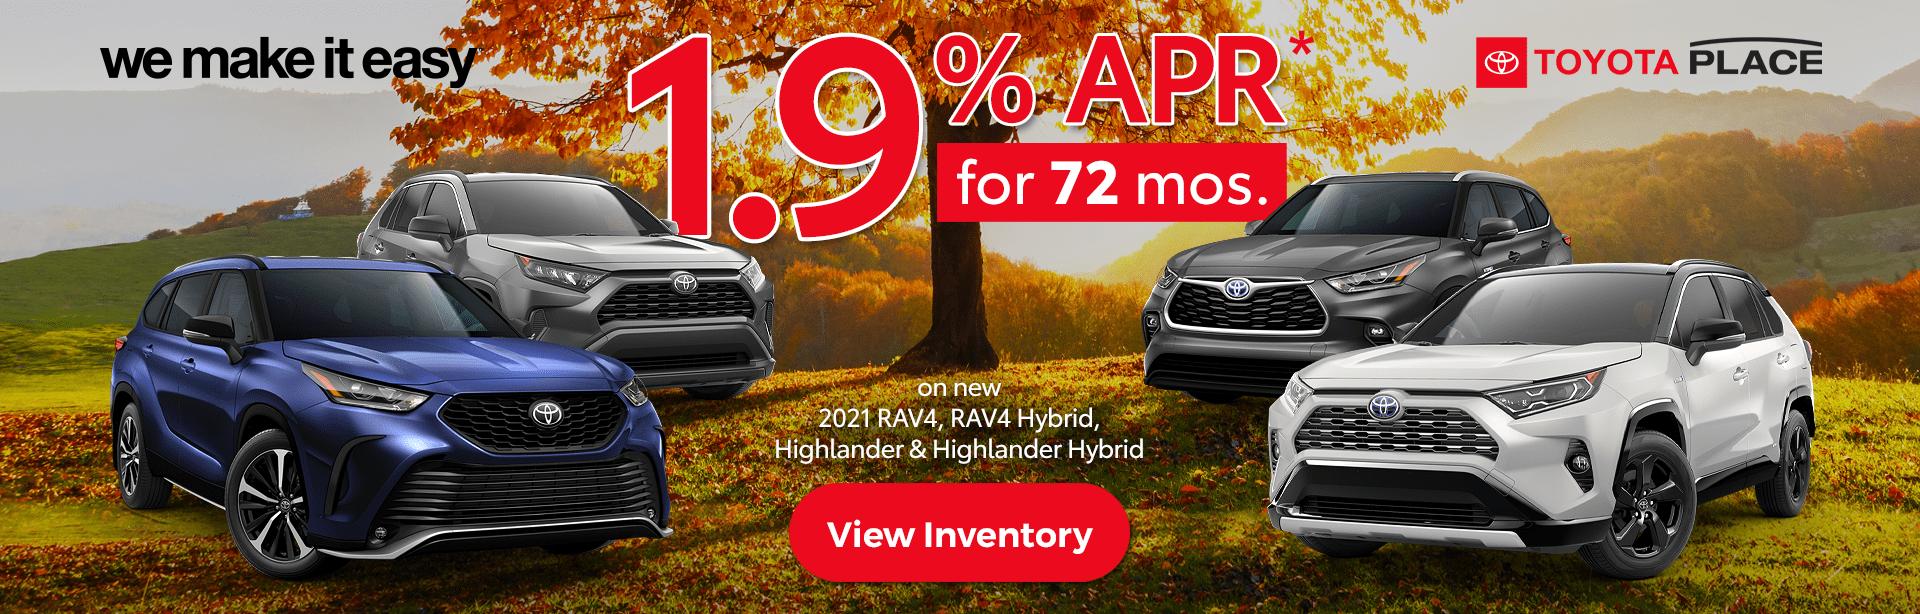 October_2021_Toyota_Place_We_Make_it_Easy_Toyota_RAV4_Highlander